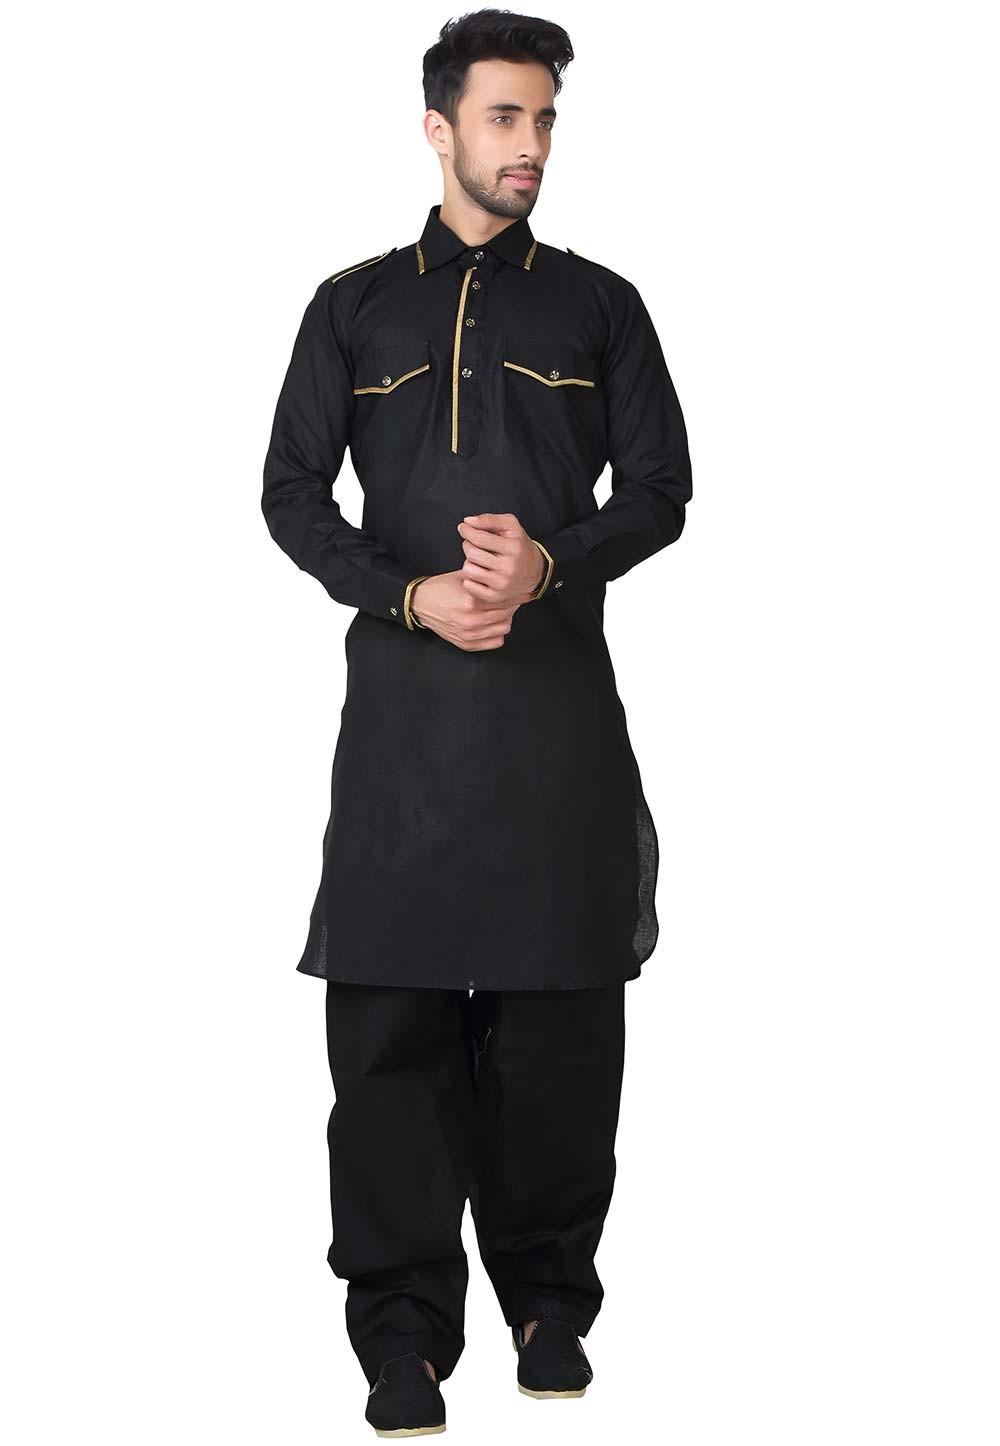 Exquisite Black Color Pathani Kurta Pajama Online